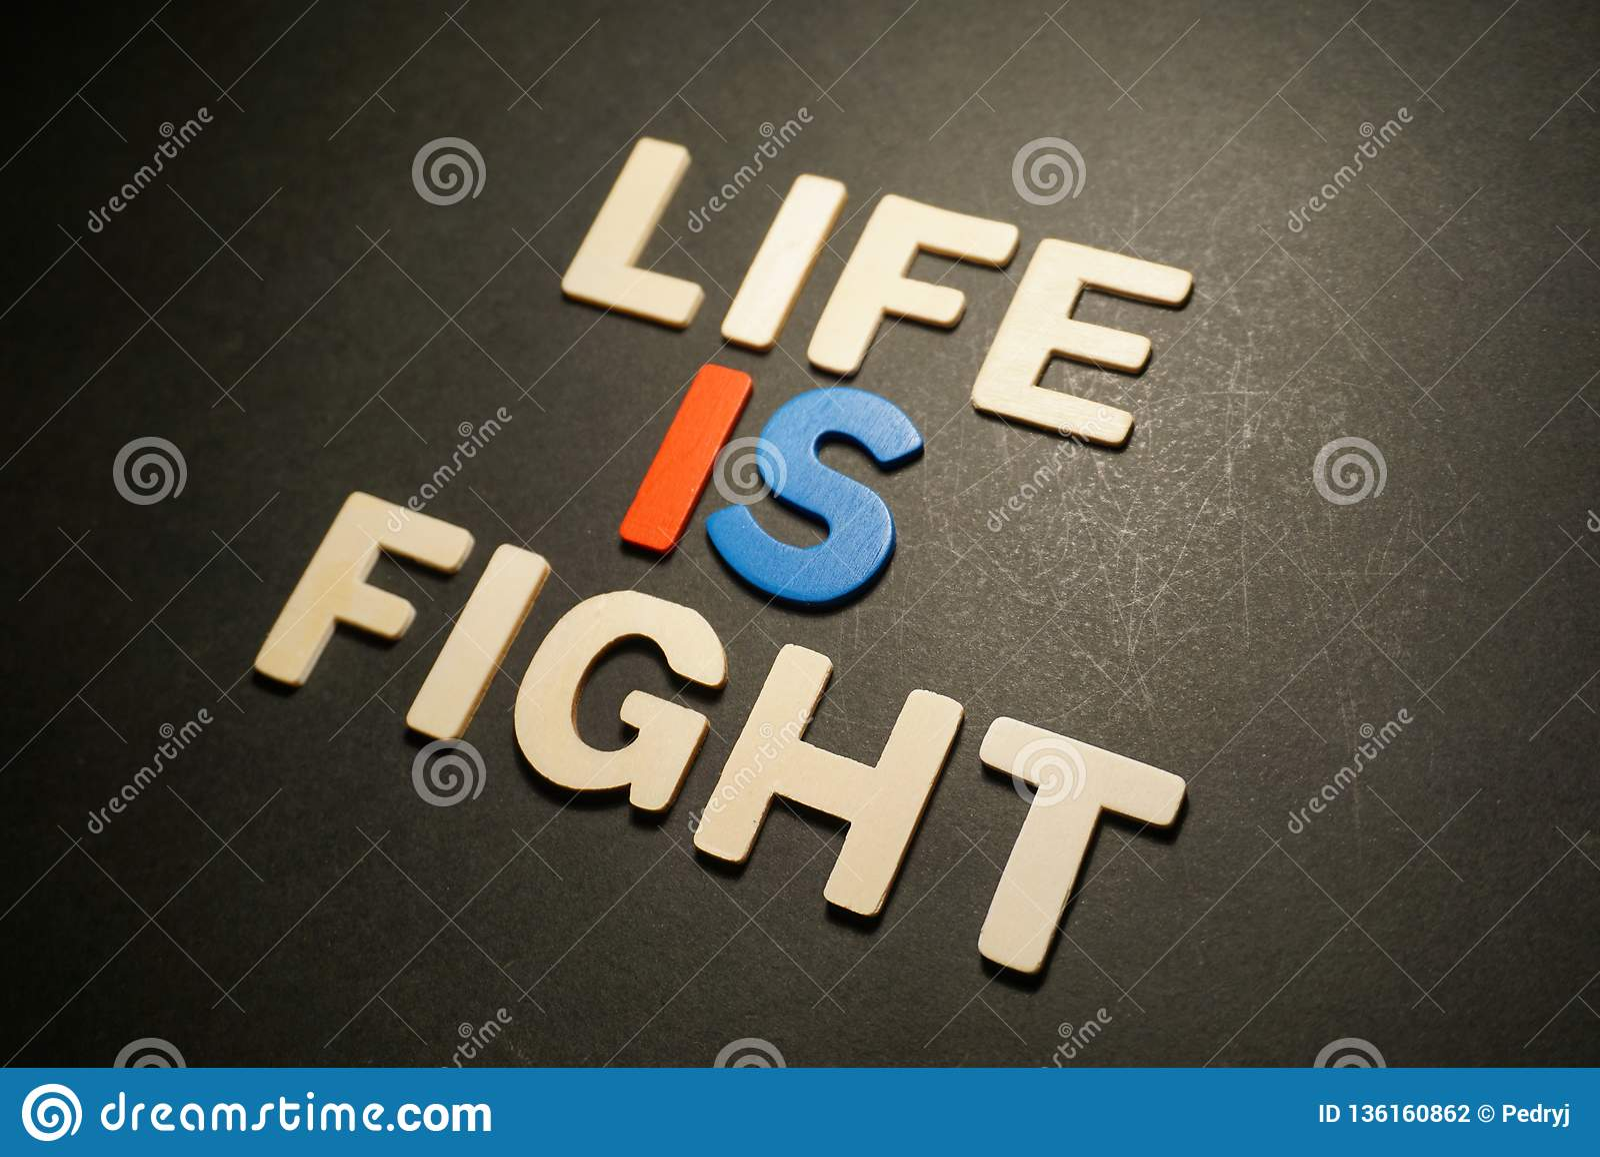 La vie est combat